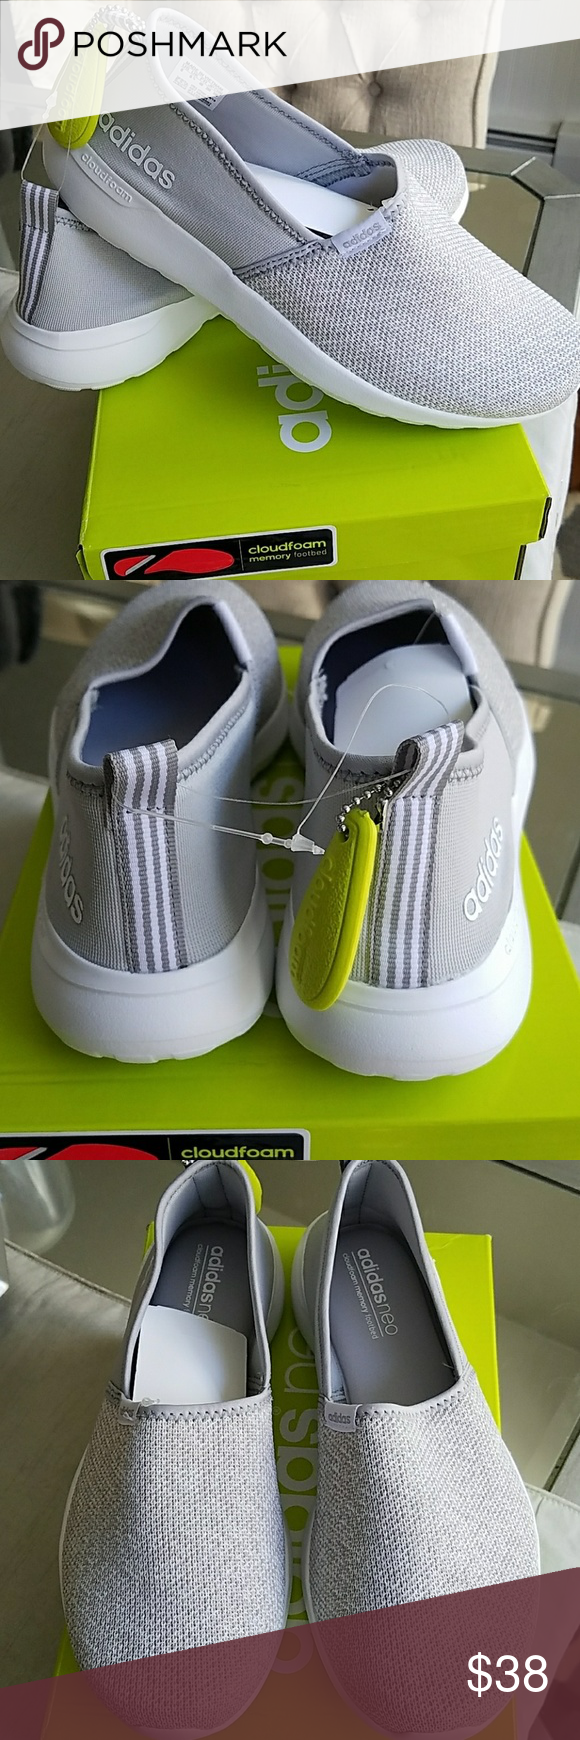 Adidas neo cloudfoam Racer Kit escape Slip - on zapatos adidas neo cloudfoam Racer